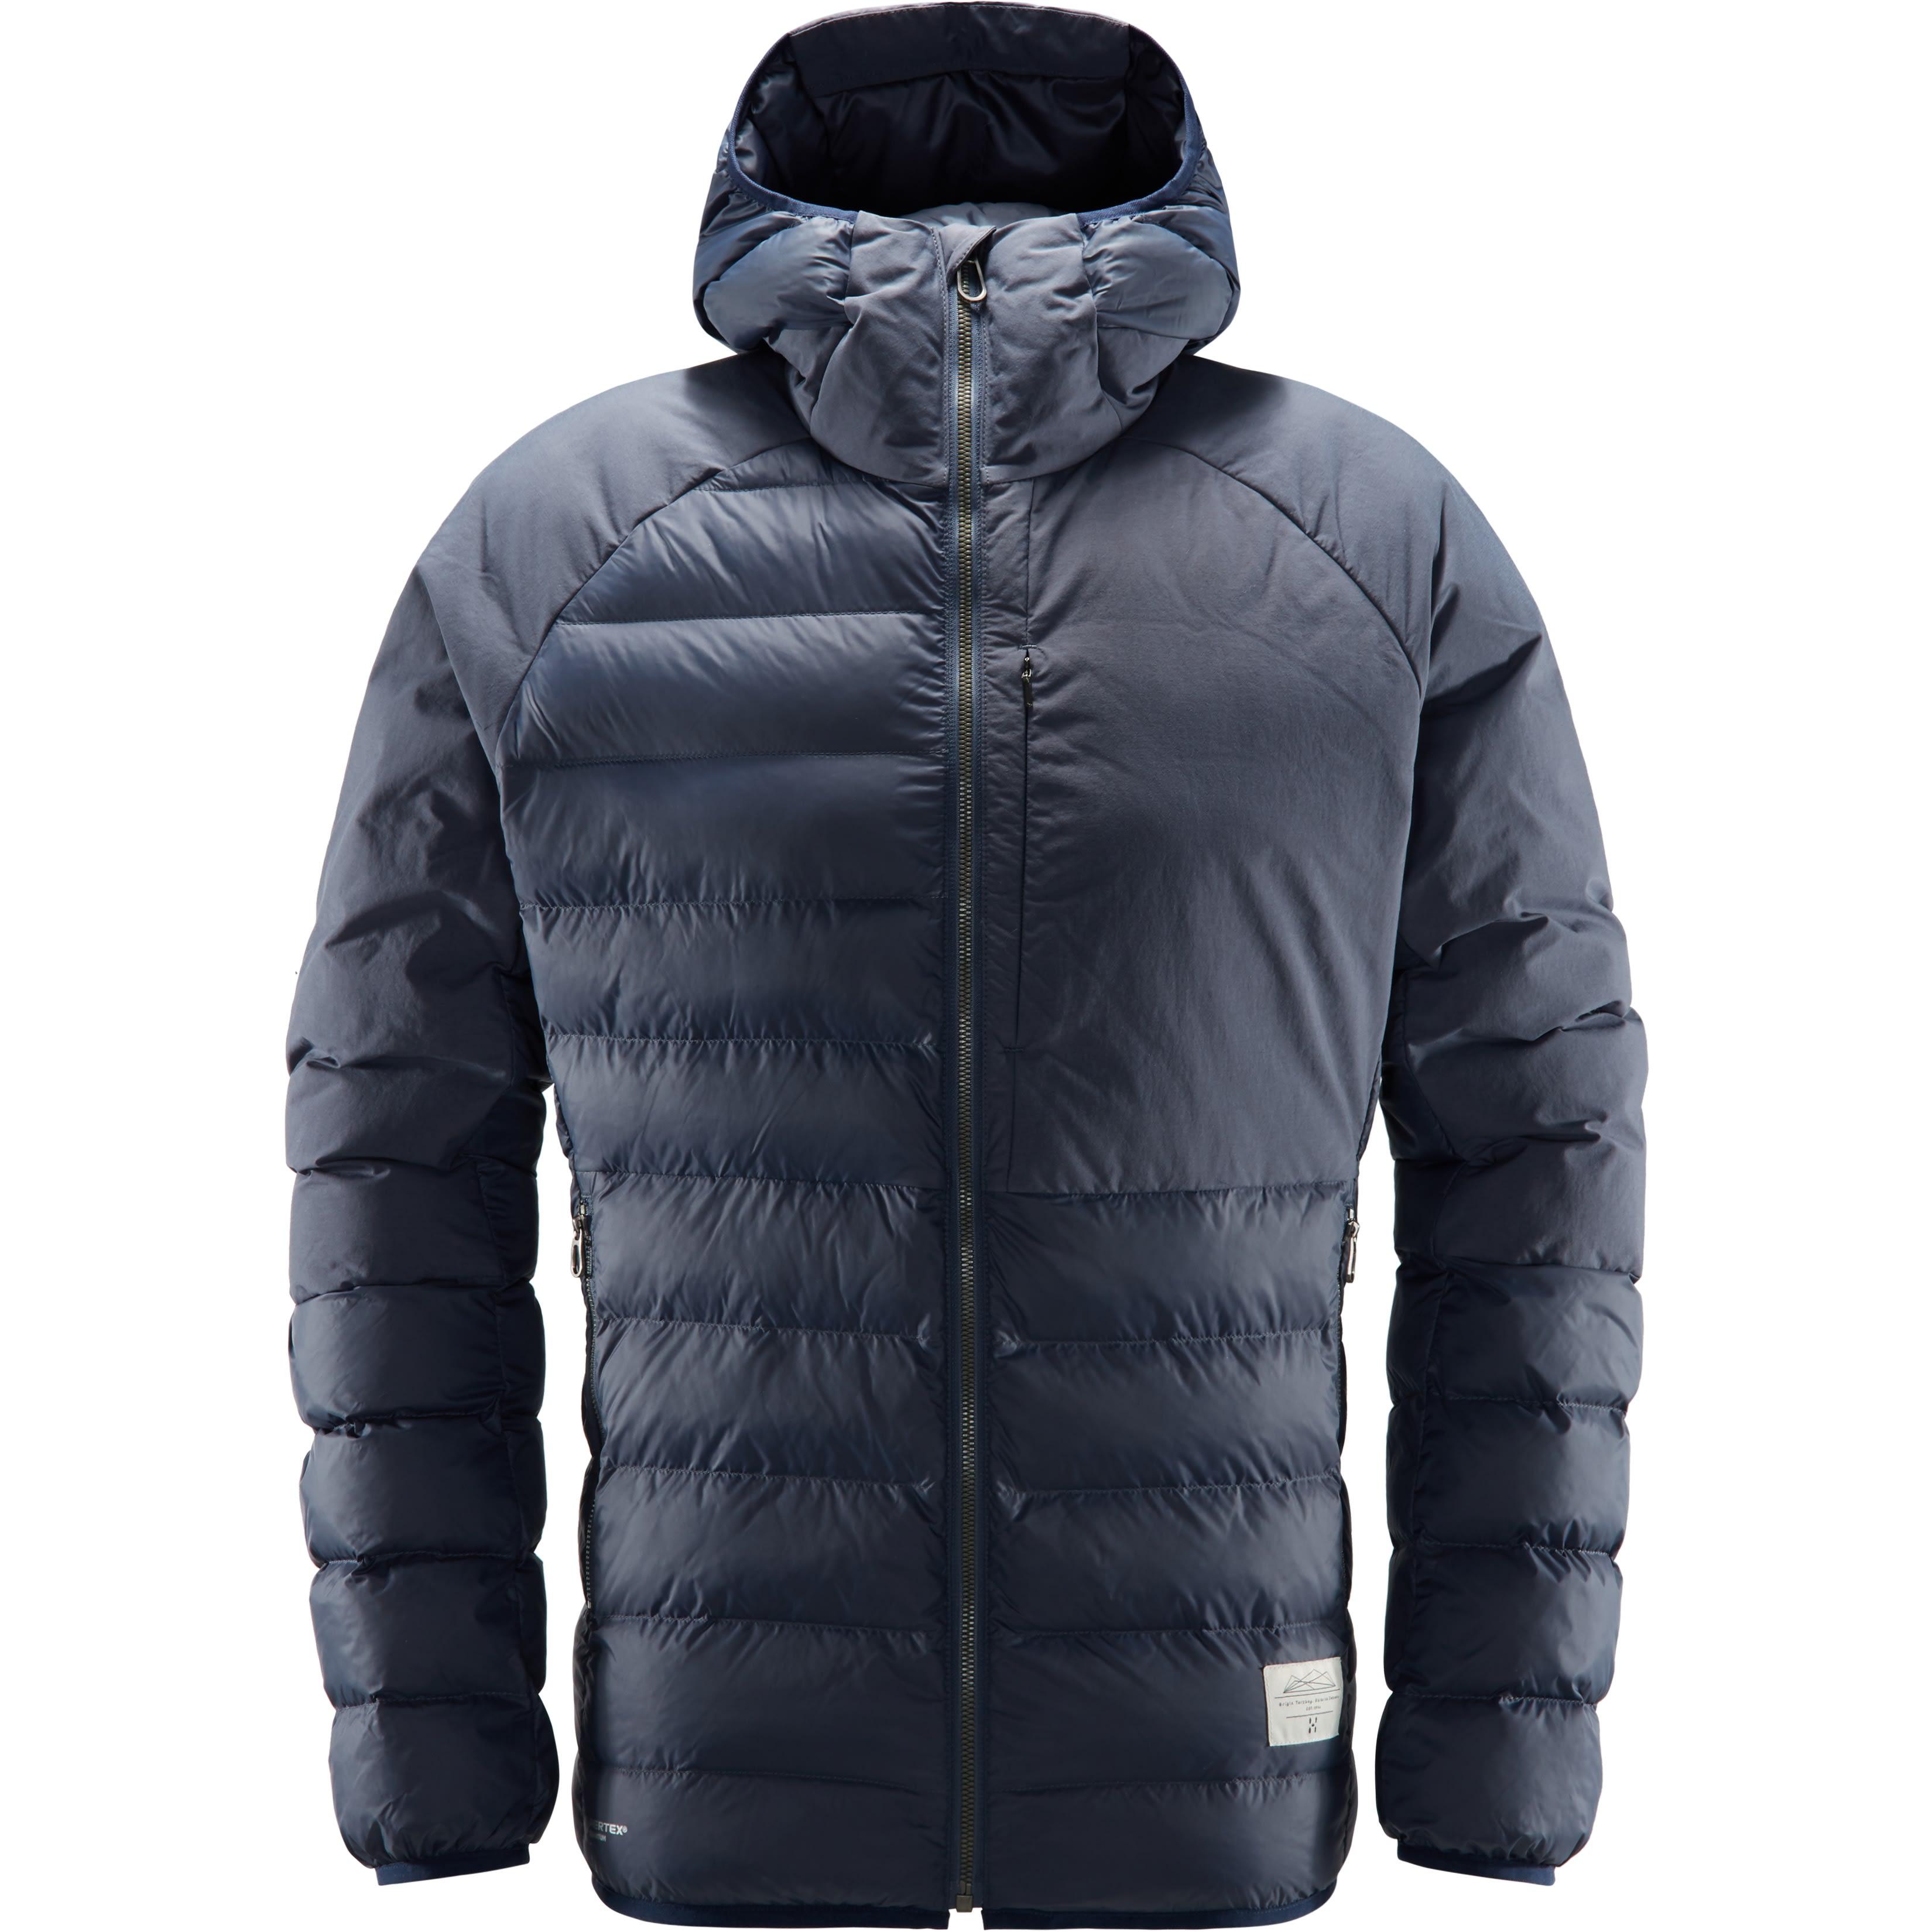 Hagl/öfs Mens Dala Mimic Hood Jacket